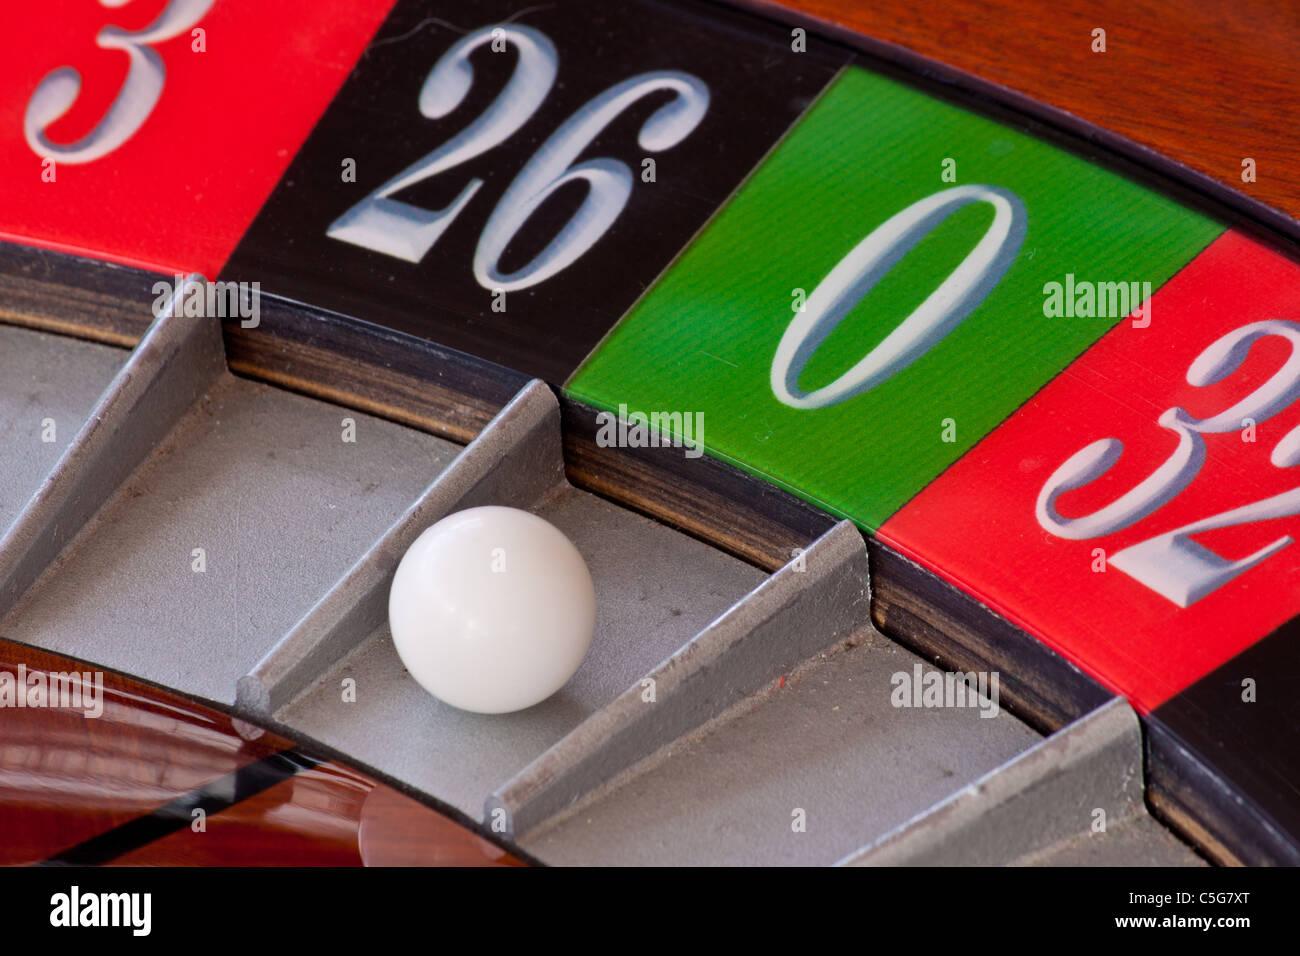 European Casino Roulette Wheel Ball Number 0 Zero Stock Photo Alamy